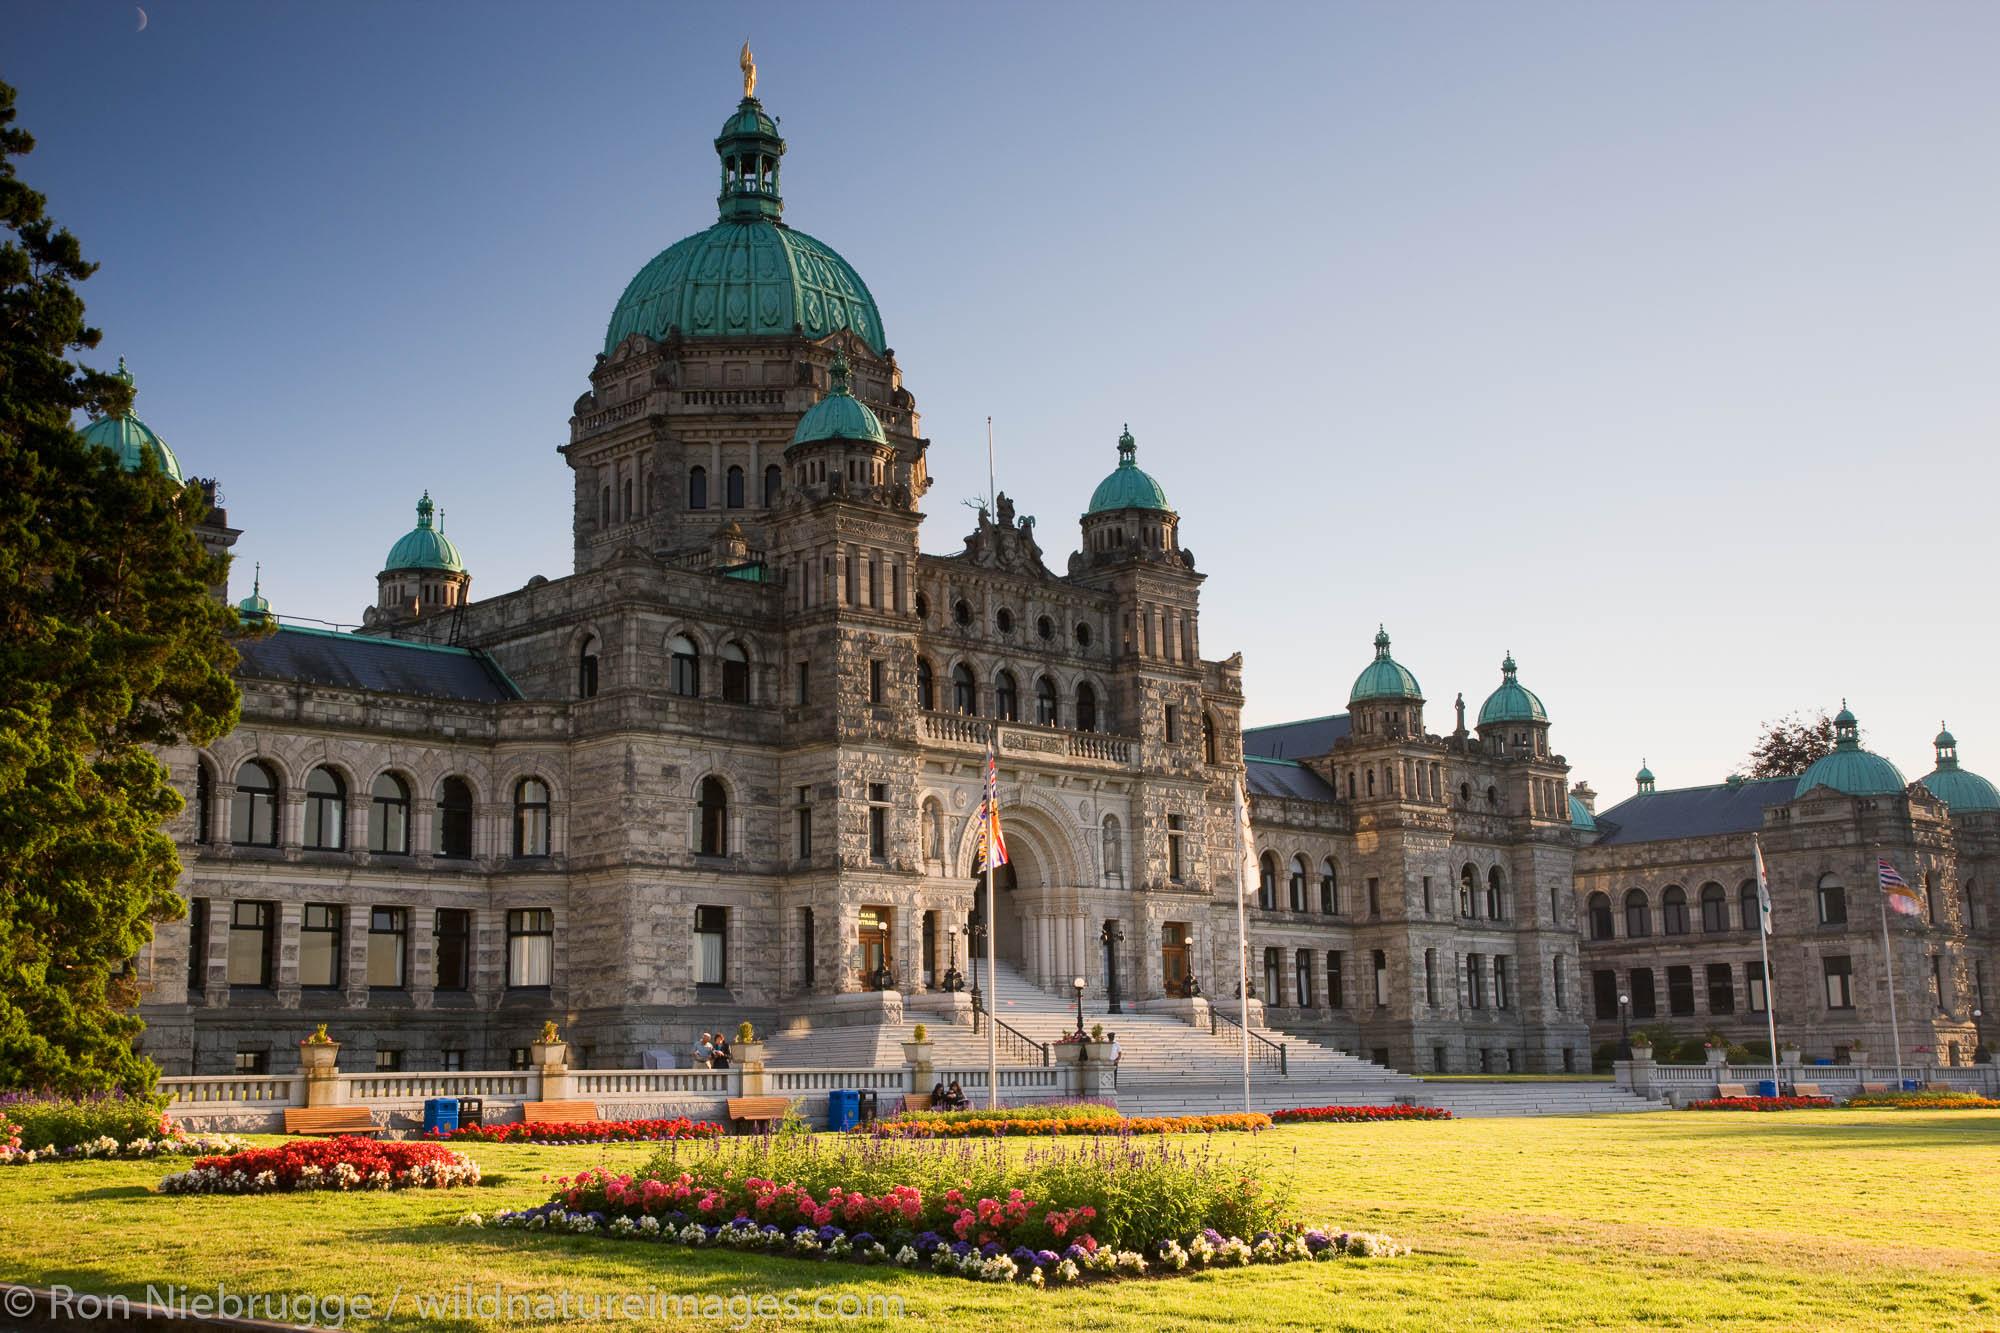 Victoria, Vancouver Island, British Columbia, Canada, photos, photo